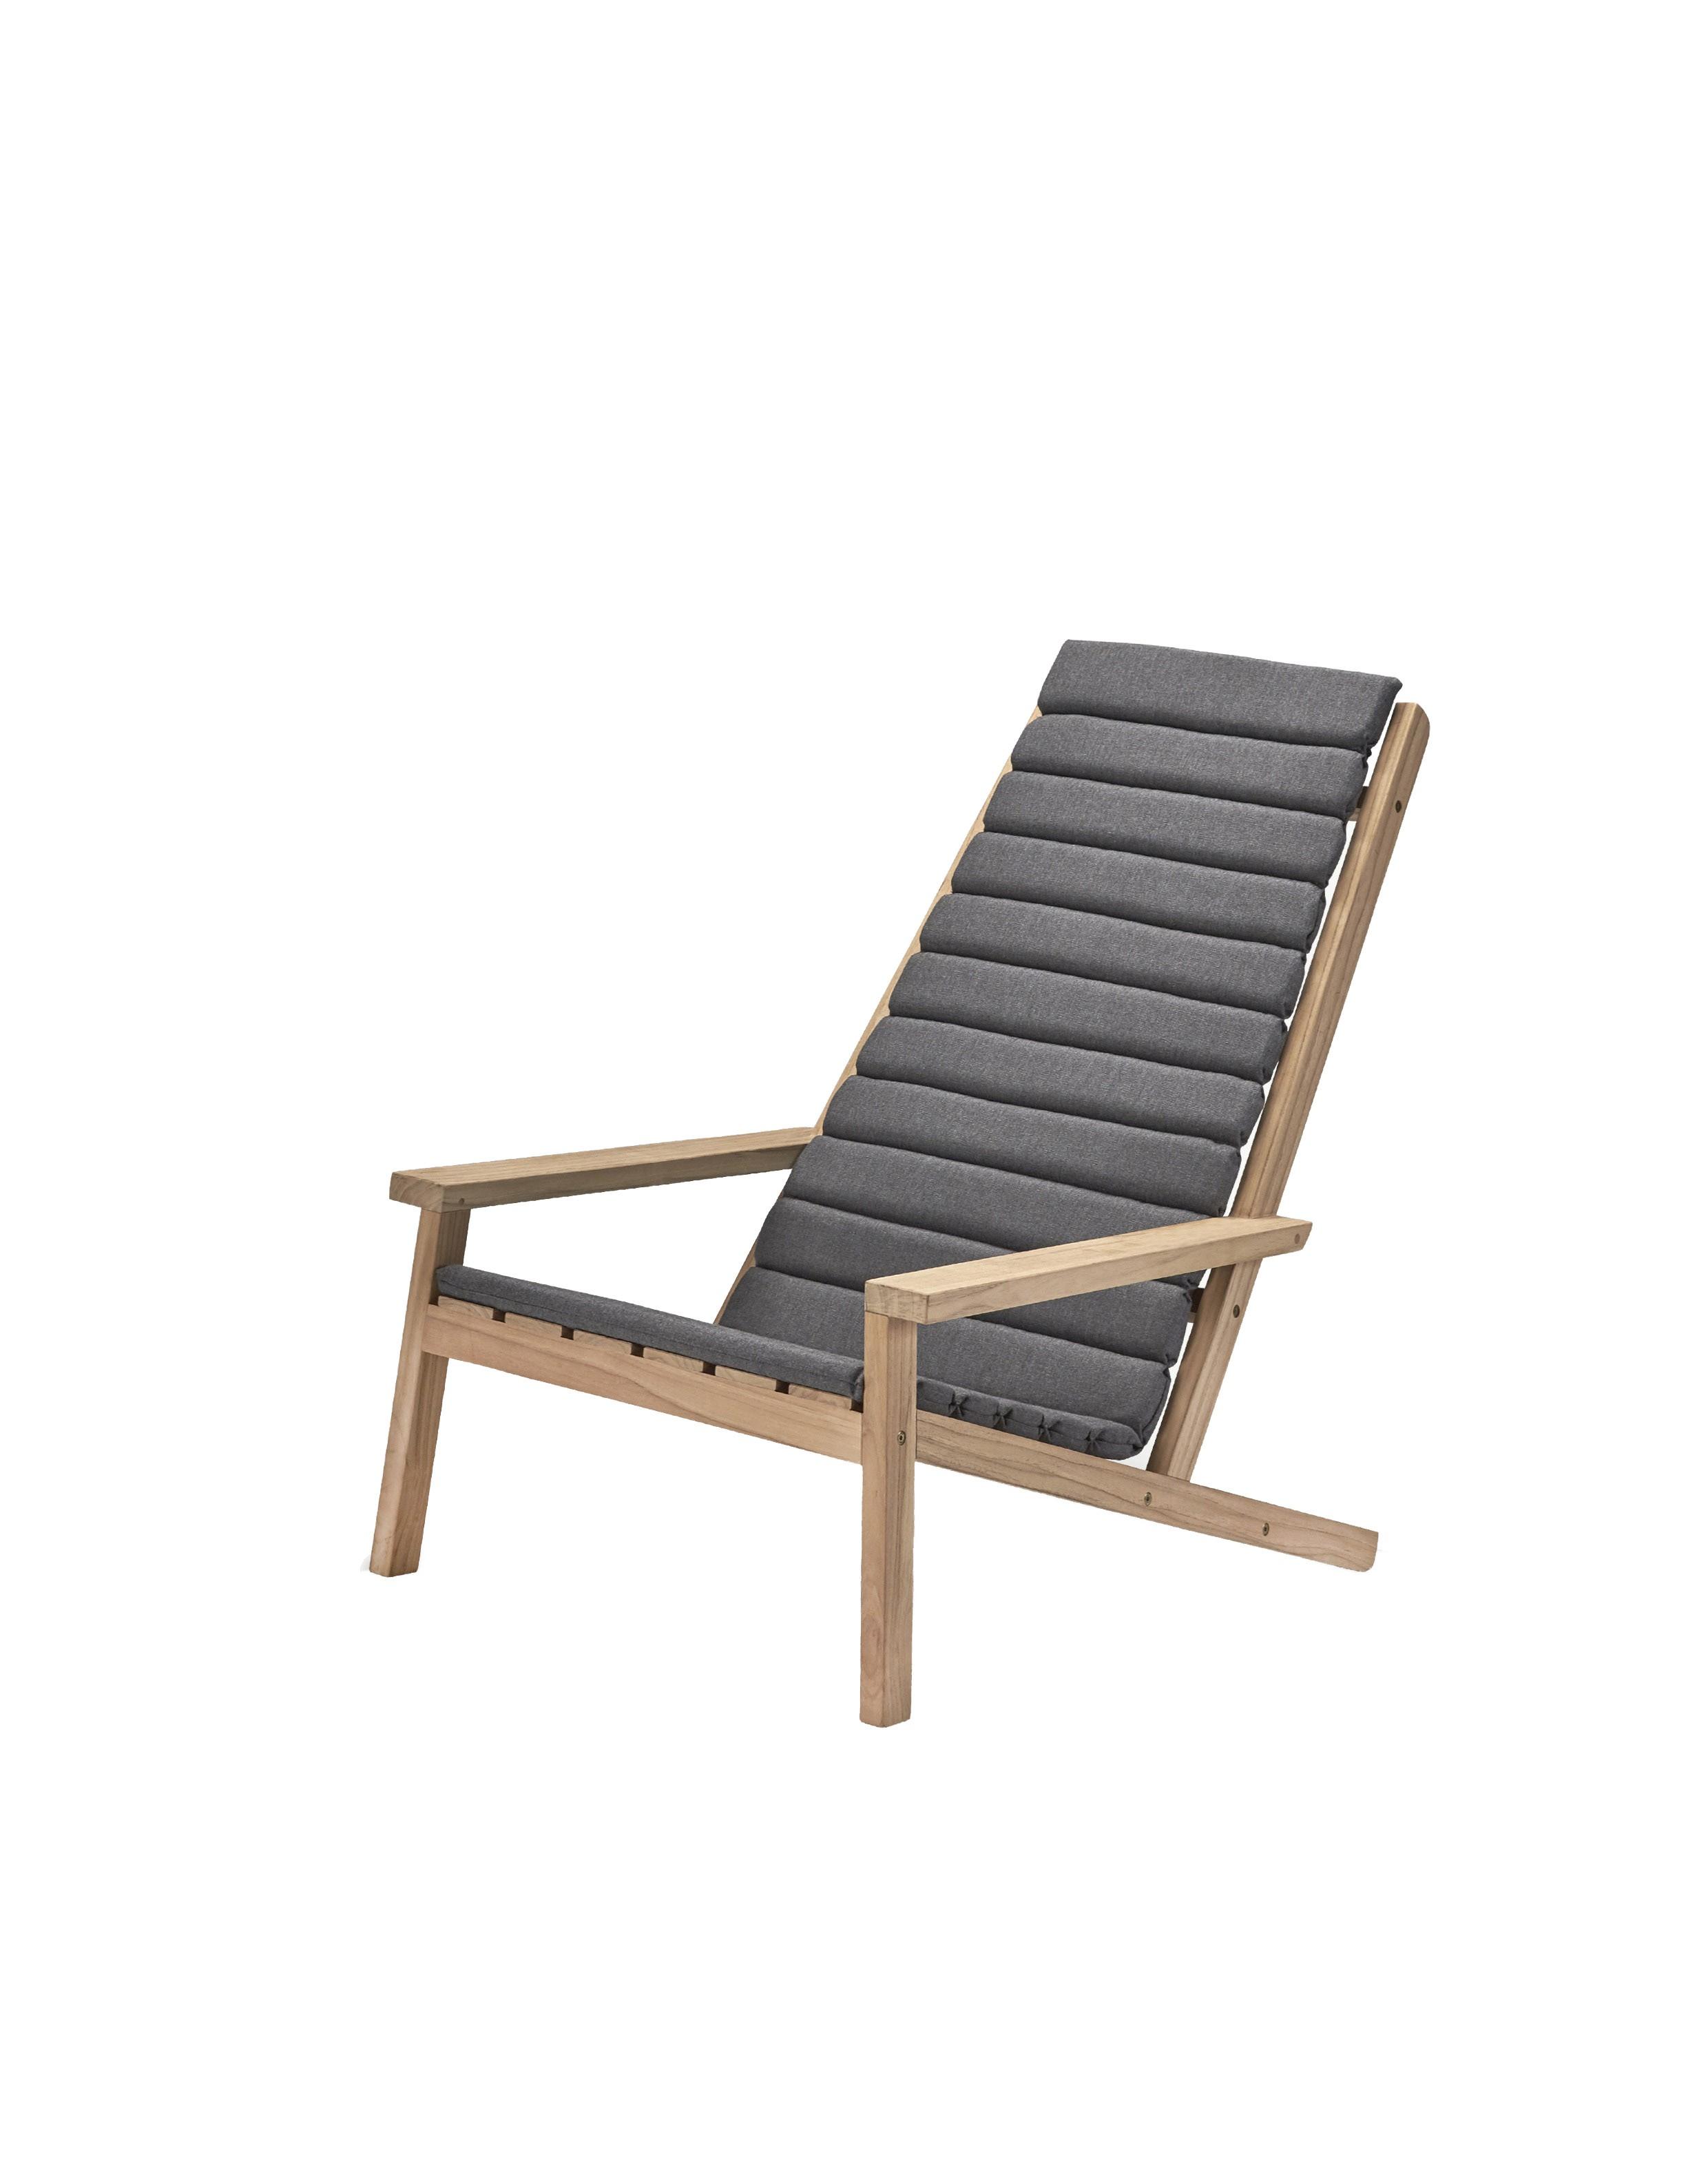 fauteuil bas en teck between lines de skagerak 2 options. Black Bedroom Furniture Sets. Home Design Ideas